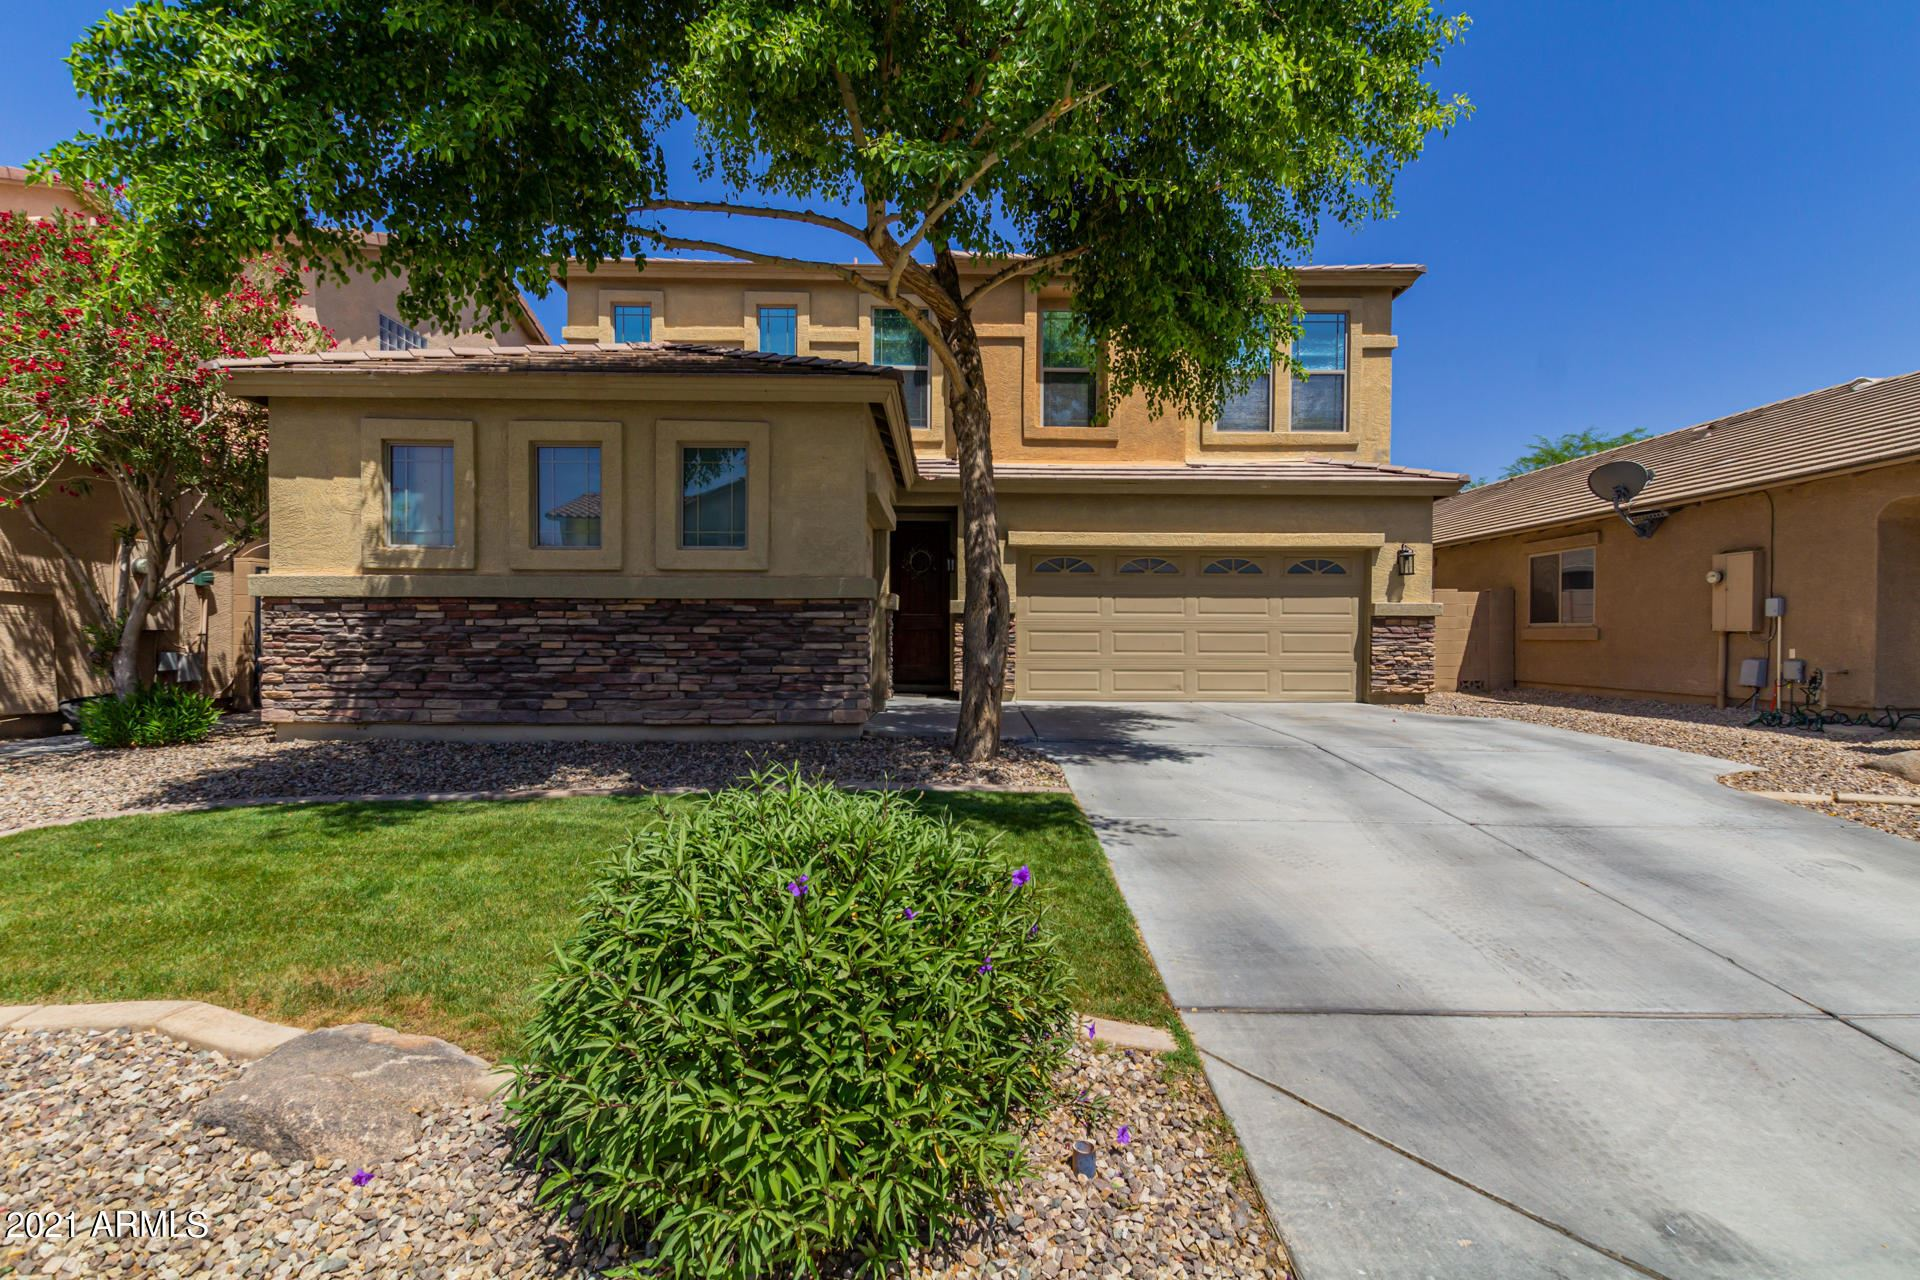 3815 S 99TH Drive, Tolleson, AZ 85353 - MLS#: 6235267